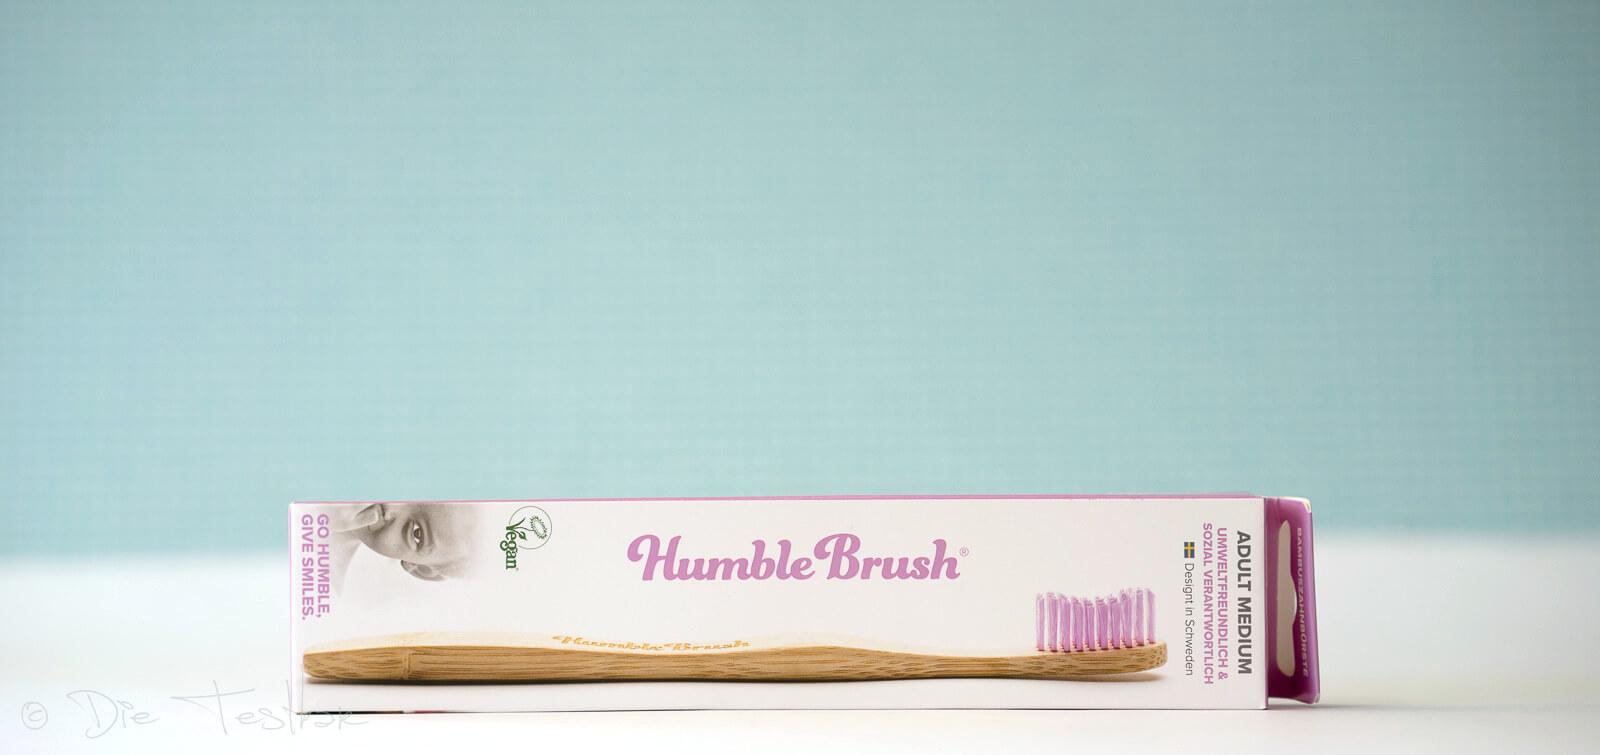 The Humble - Brush Bambuszahnbürste